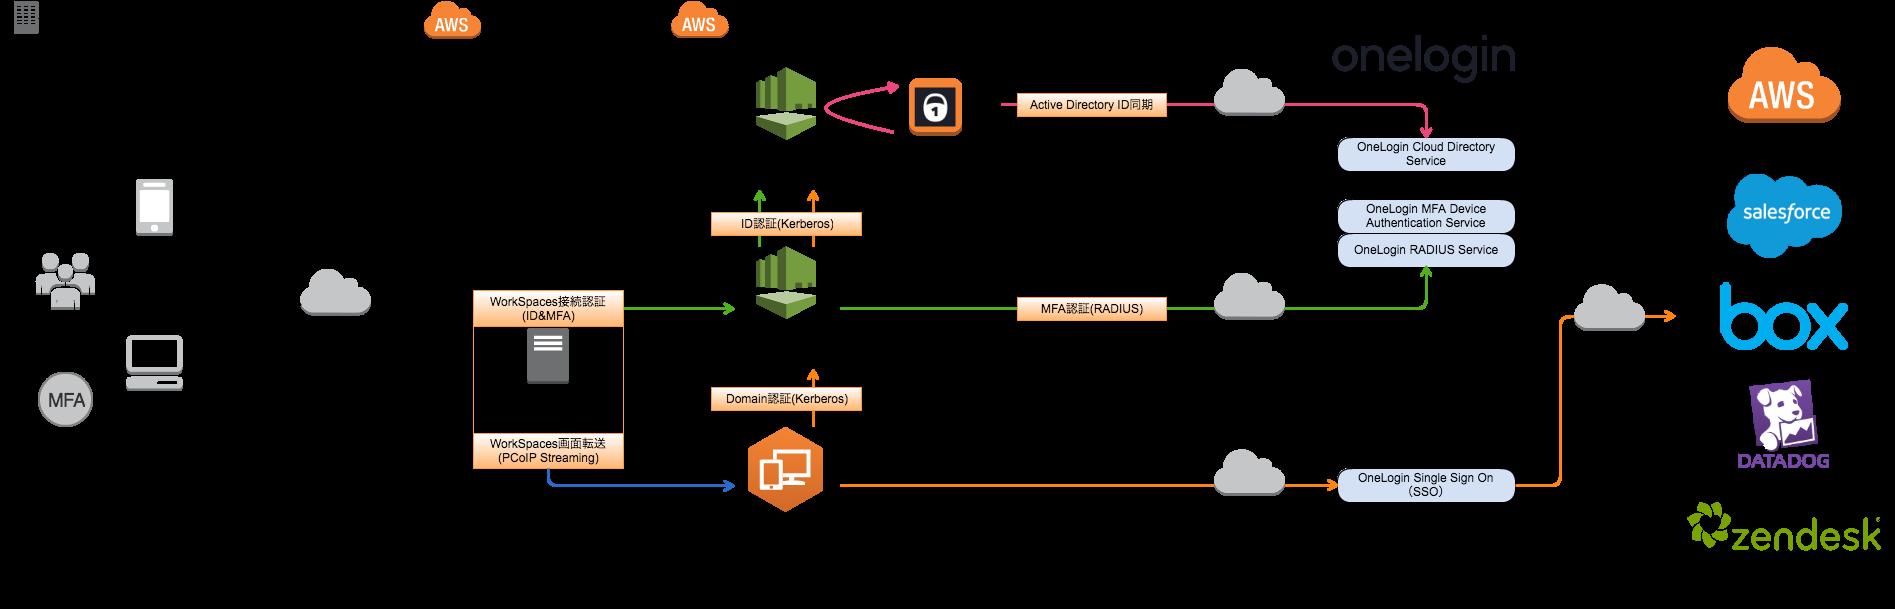 Aws Directory Serviceとoneloginを組み合わせて Amazon Workspacesの